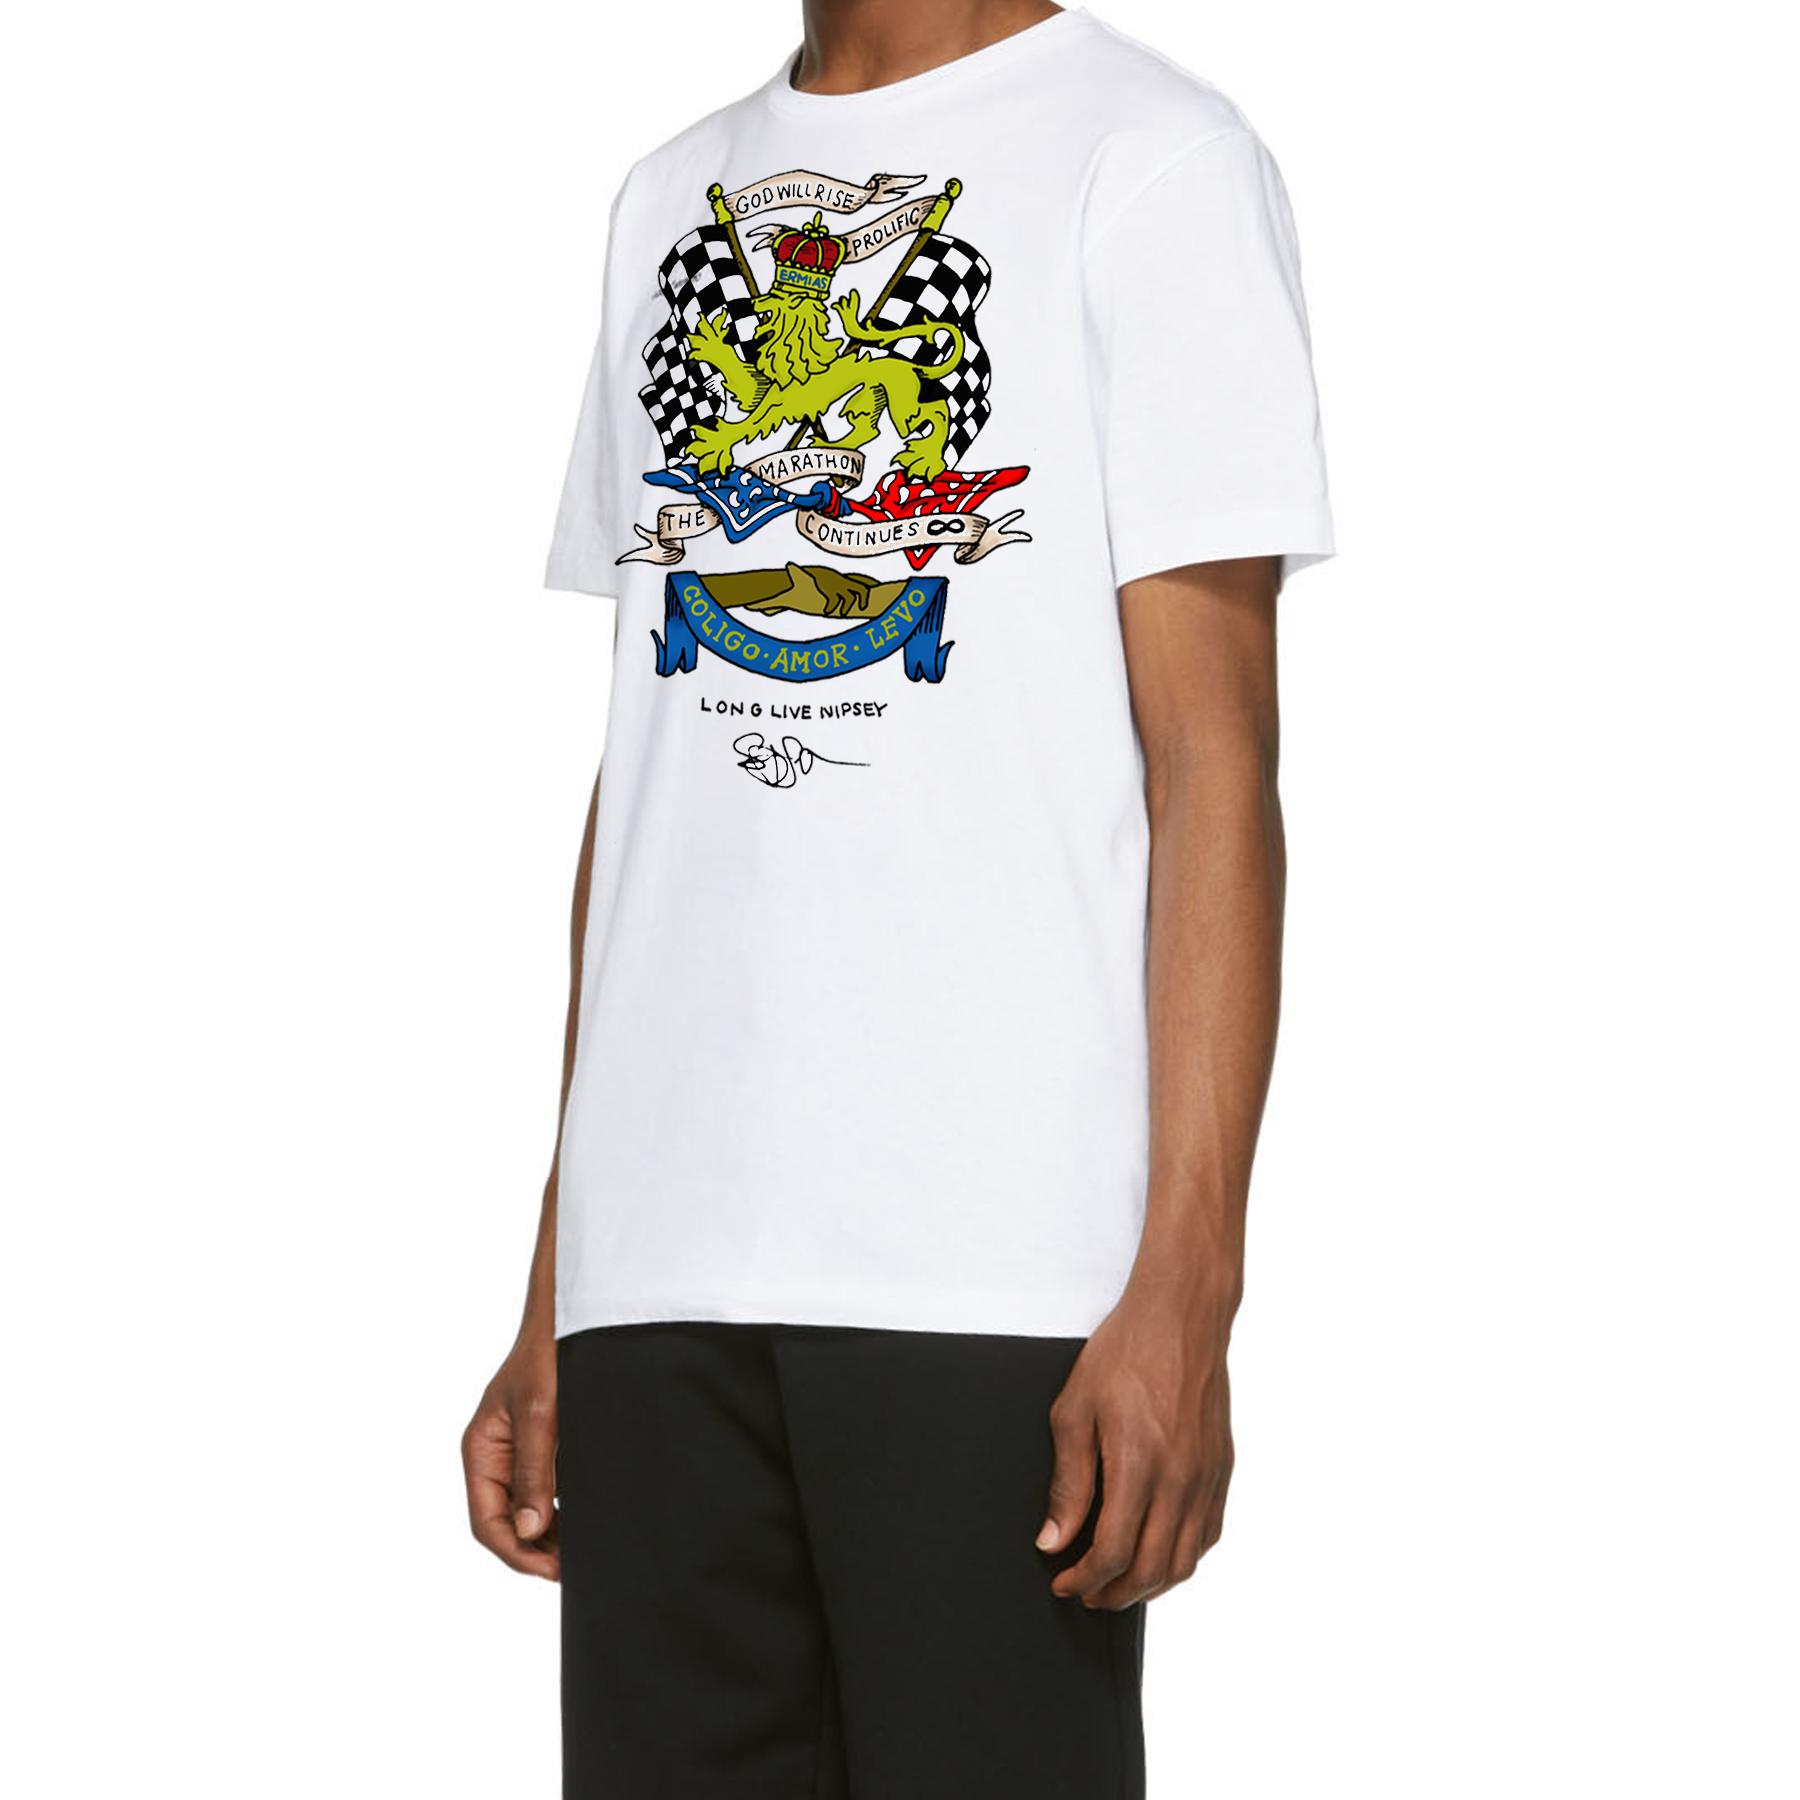 Nipsey-Dedication-Tshirt-Model.png